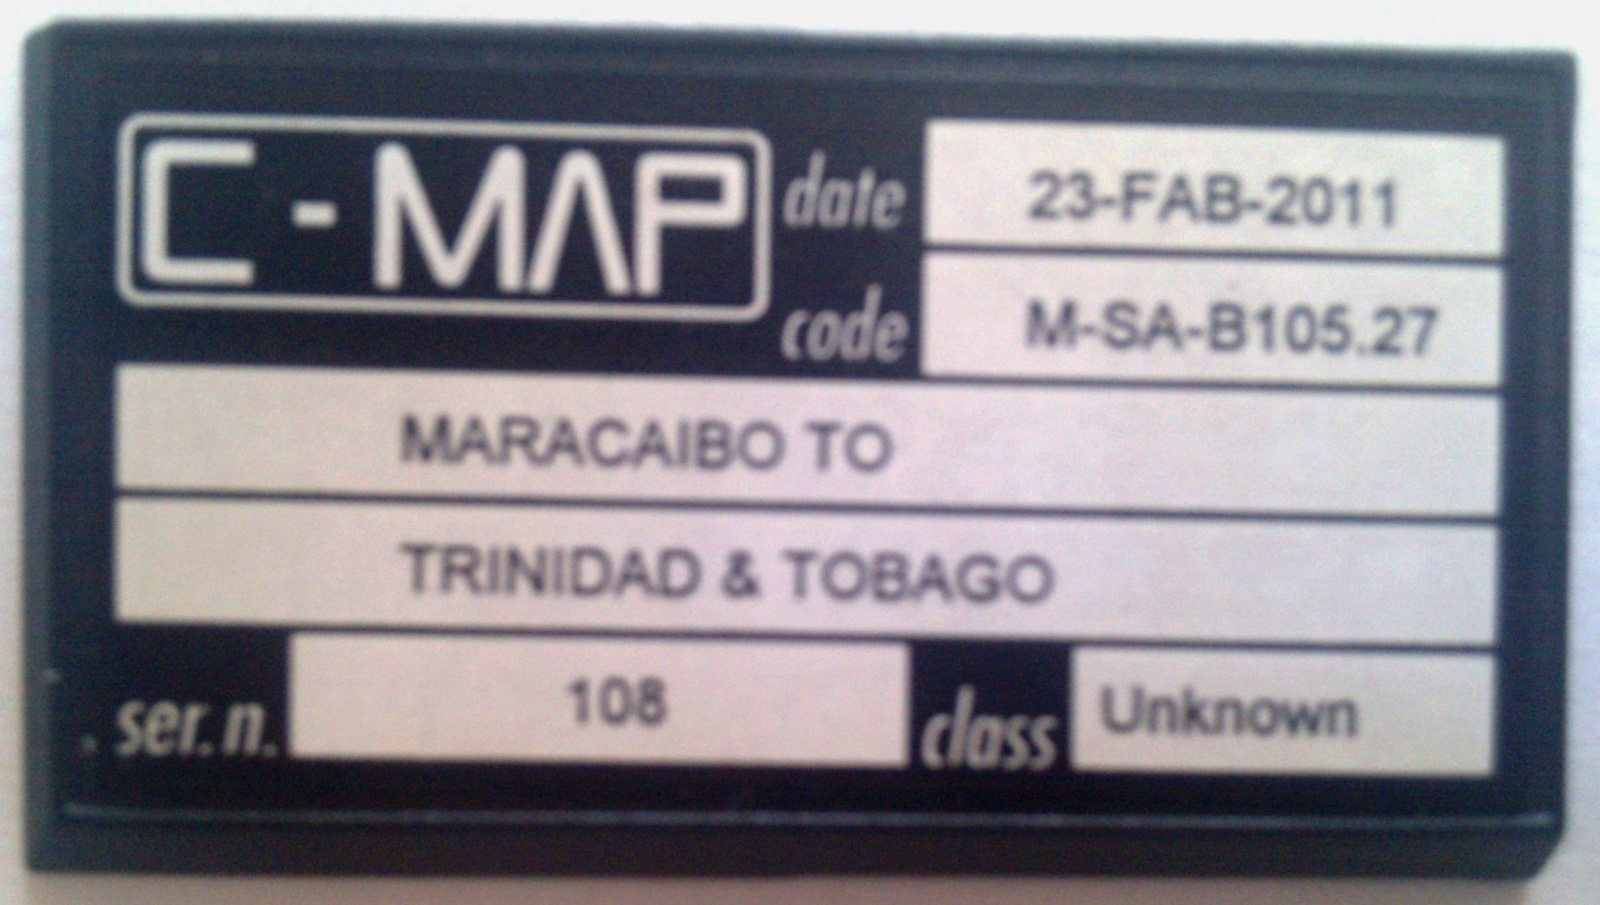 Click image for larger version  Name:C - Map Maracaibo to Trinidad & Tobago.jpg Views:101 Size:373.9 KB ID:41387